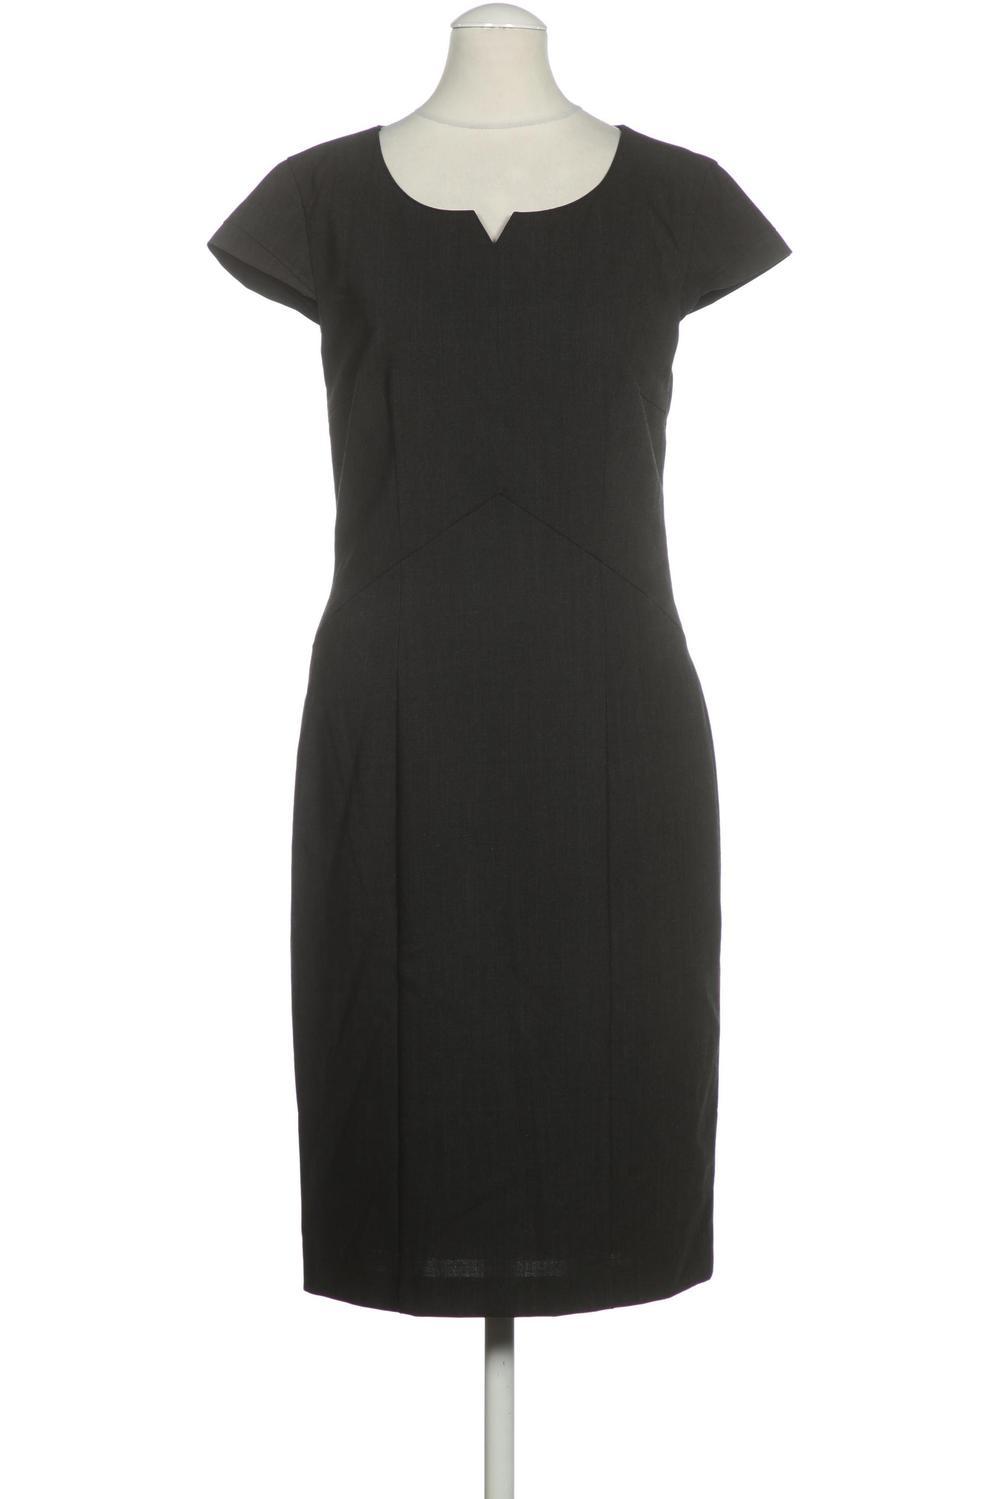 betty barclay damen kleid de 34 second hand kaufen | ubup